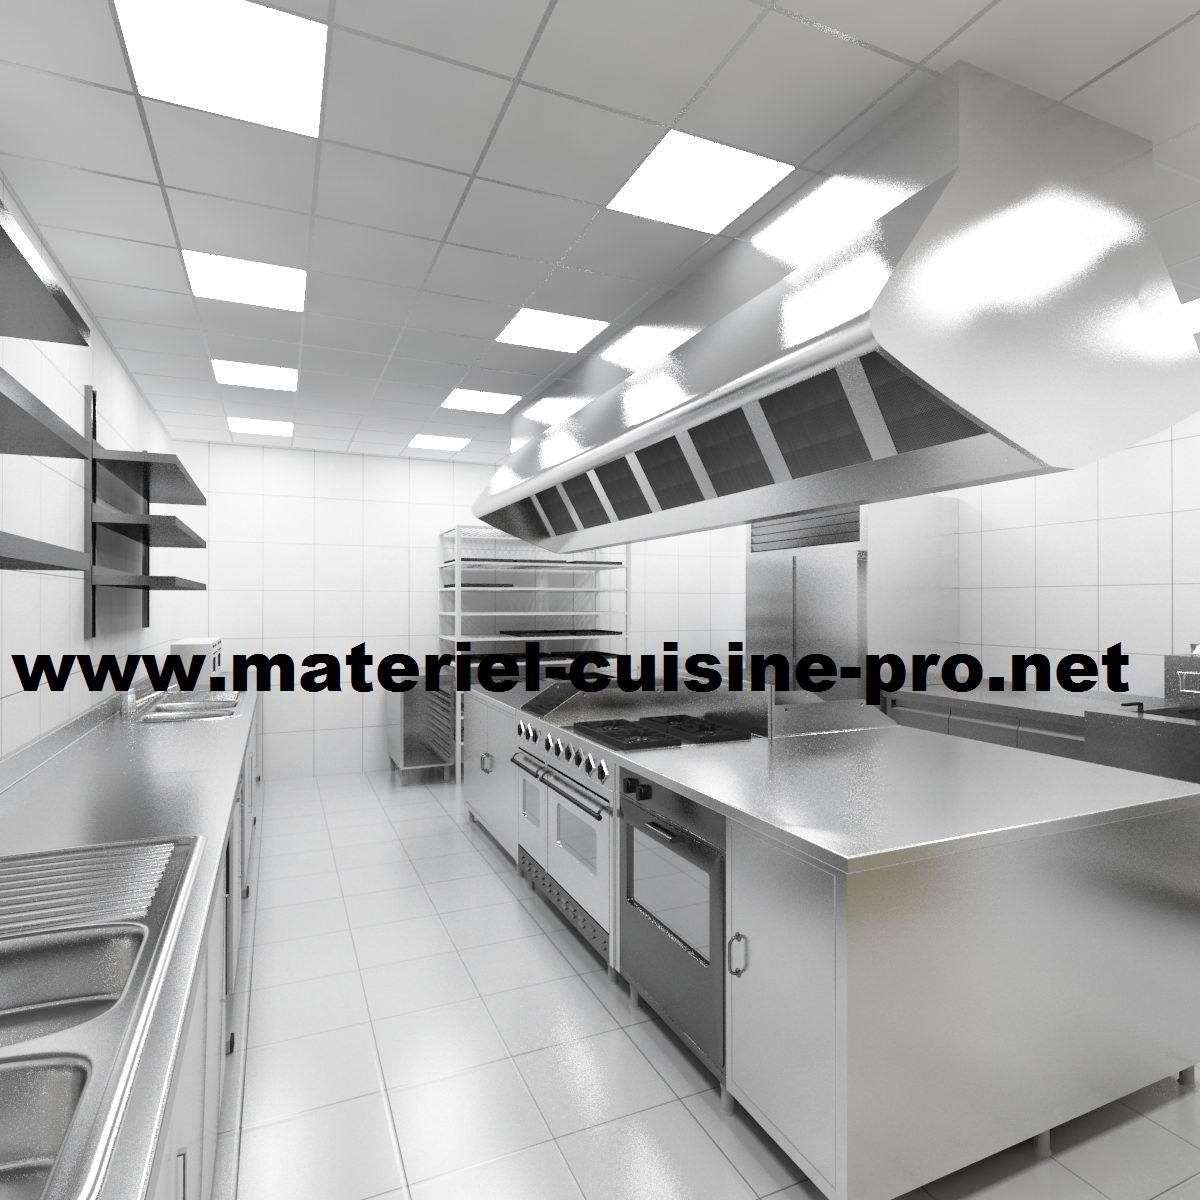 Quipement cuisine inox mat riel cuisine pro maroc for Materiel inox professionnel